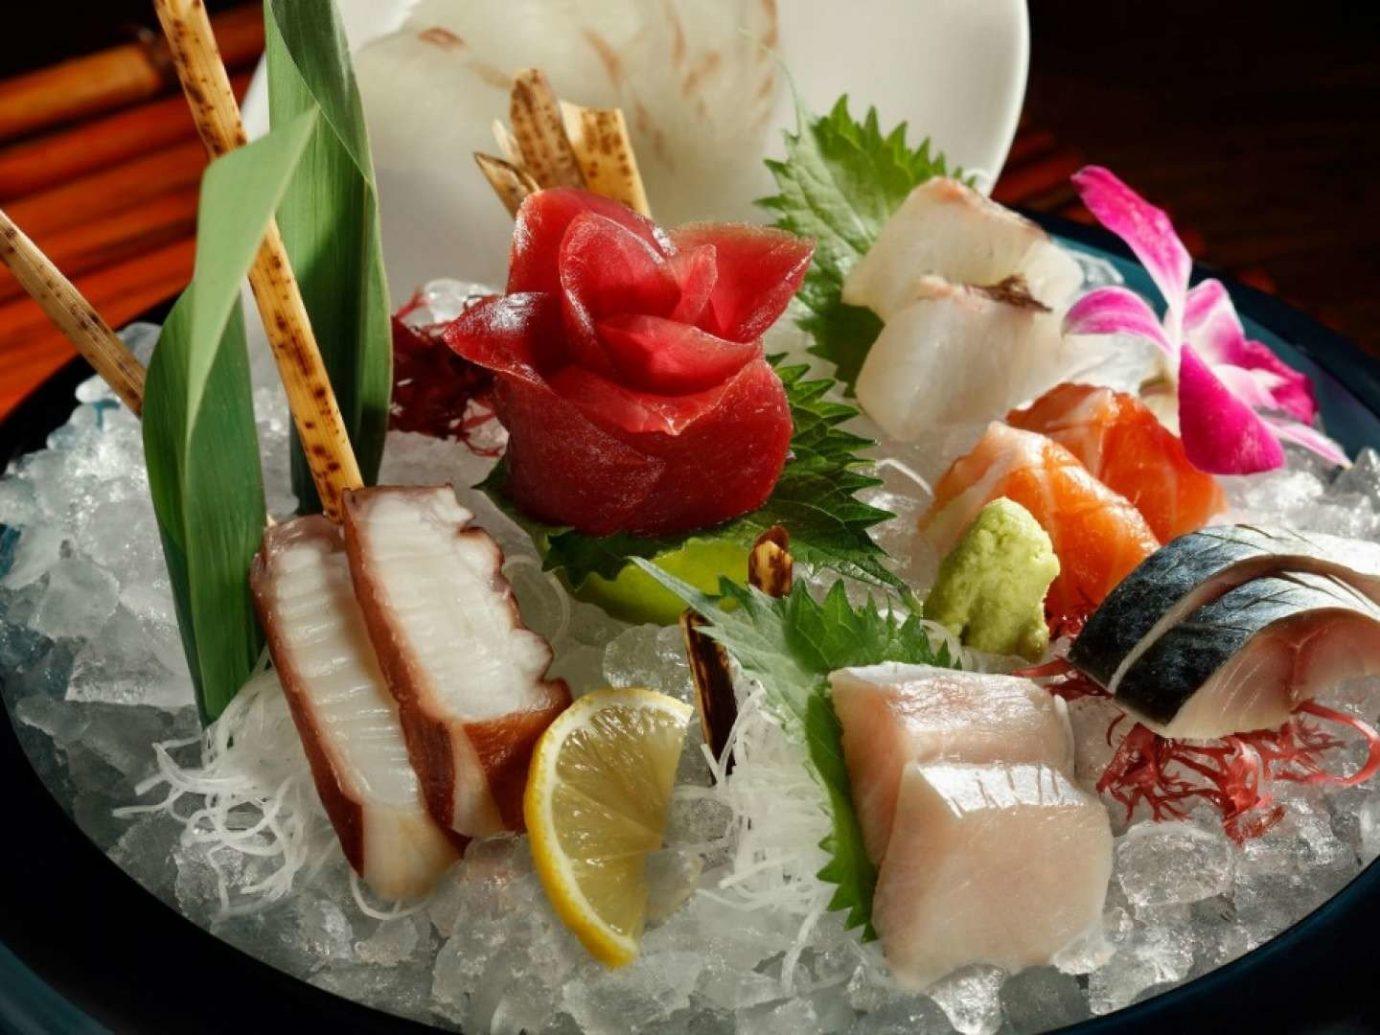 Food + Drink food dish cuisine plate meal asian food fruit hors d oeuvre sashimi fish sushi buffet hot pot fresh